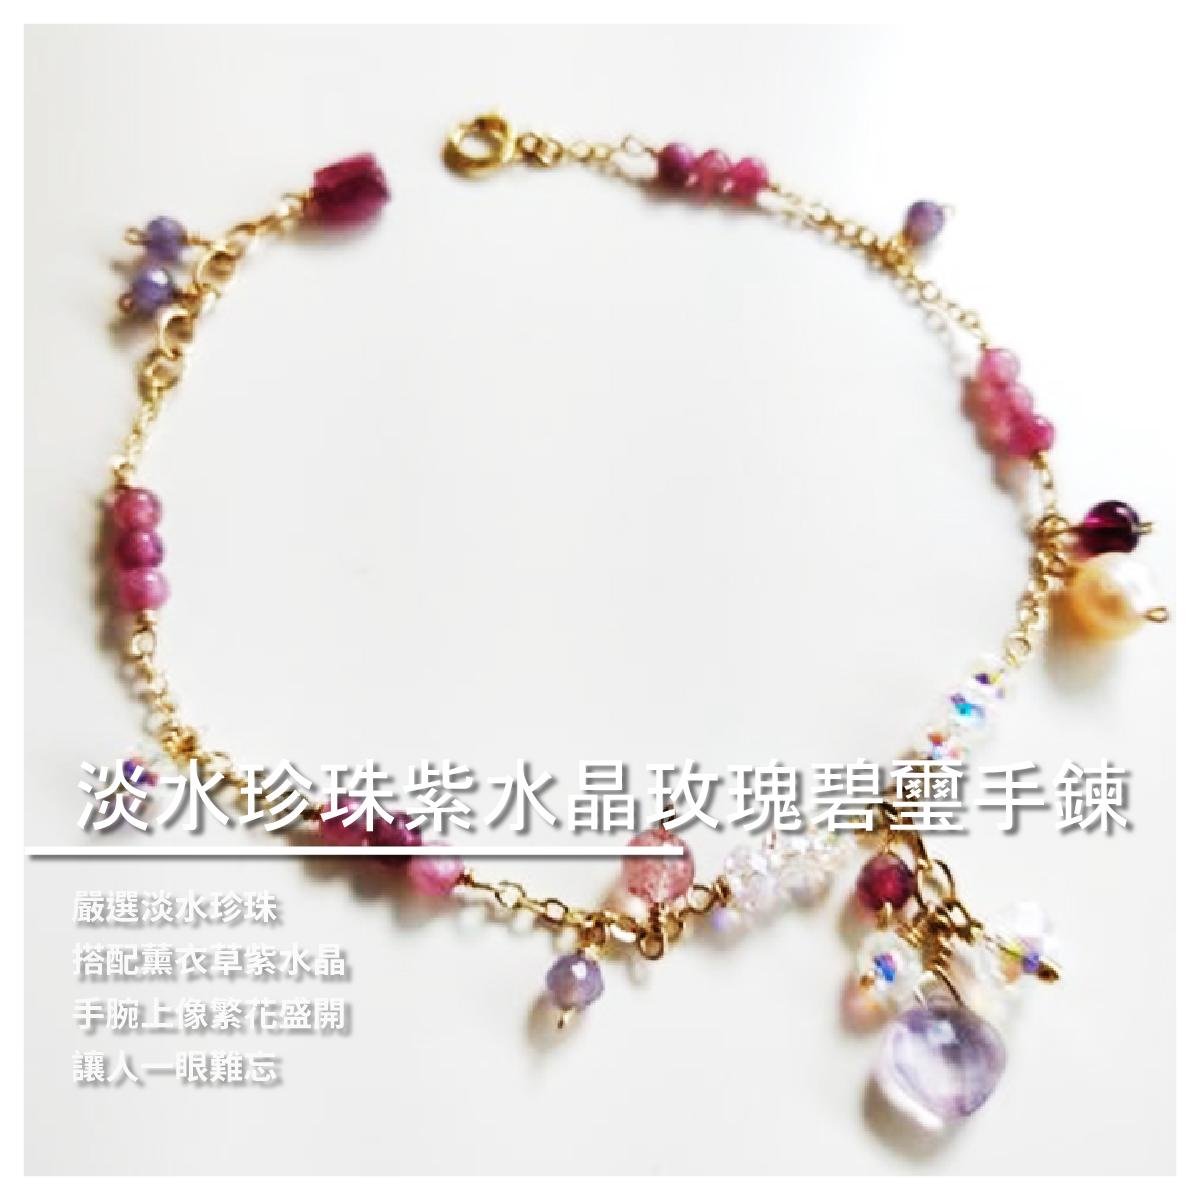 【LHN JEWELRY STUDIO】LHN淡水珍珠紫水晶玫瑰碧璽14KGF手鍊